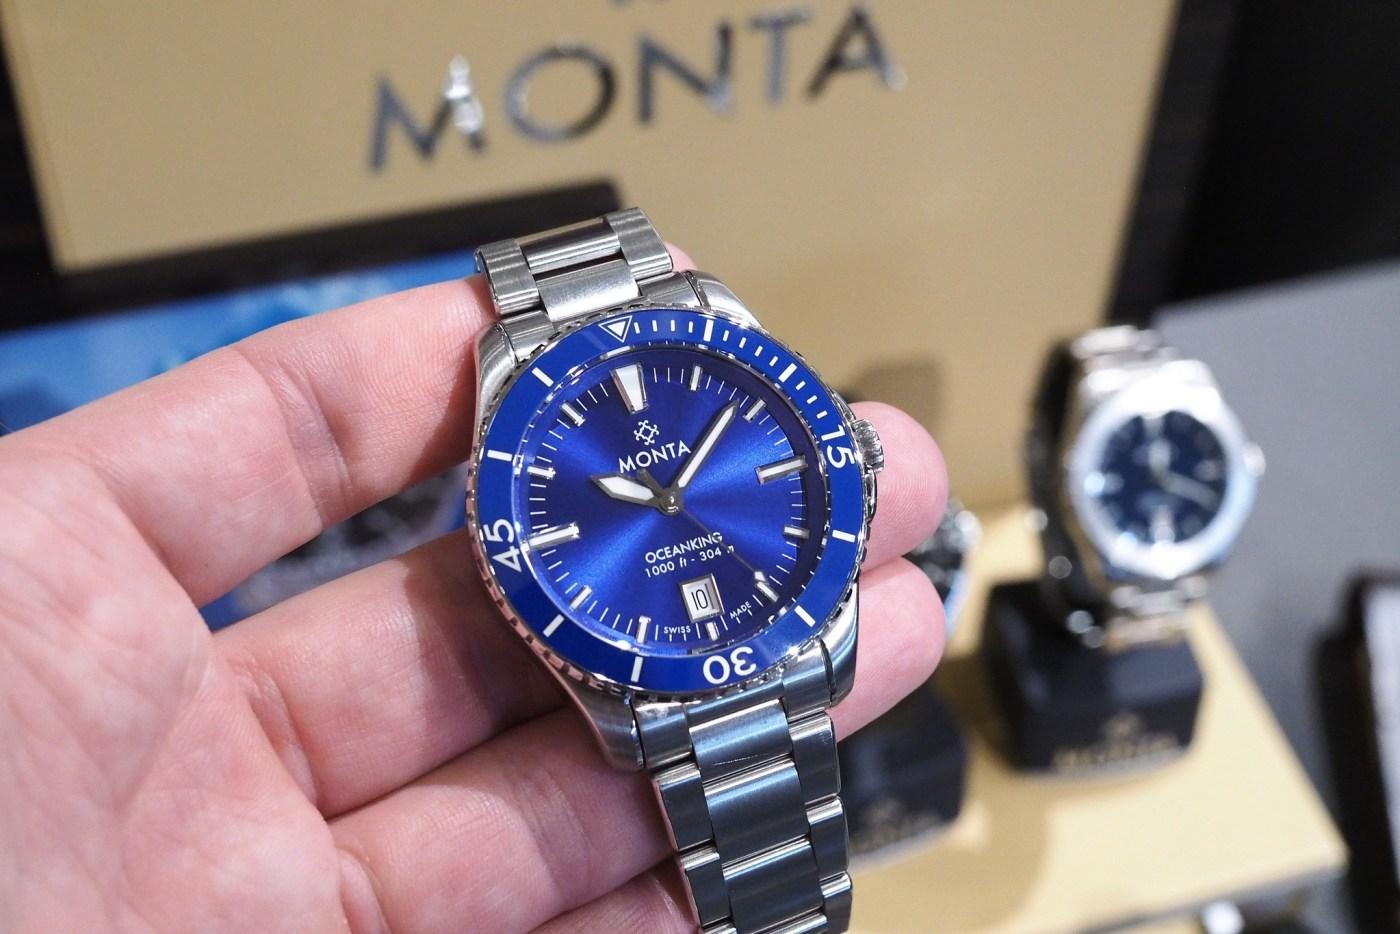 Monta Ocean King diver